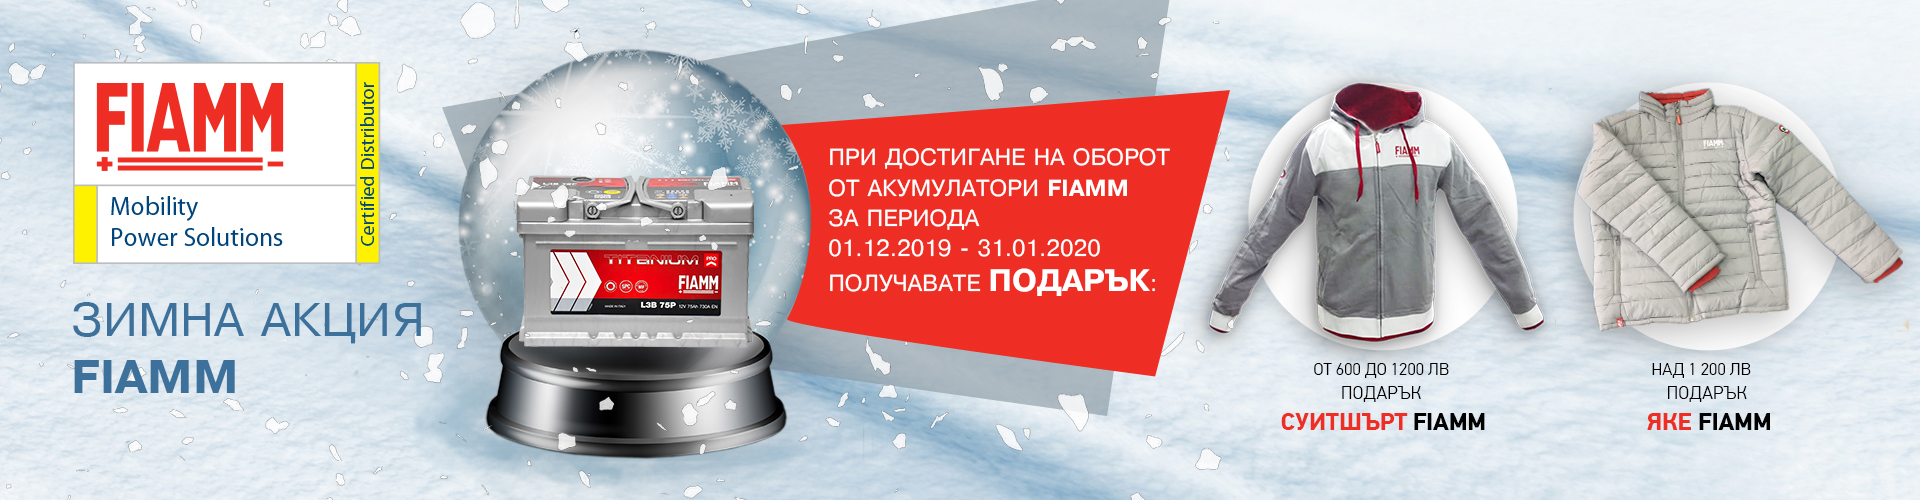 promo_fiamm_01.12.2019-31.01.2020_banner.jpg